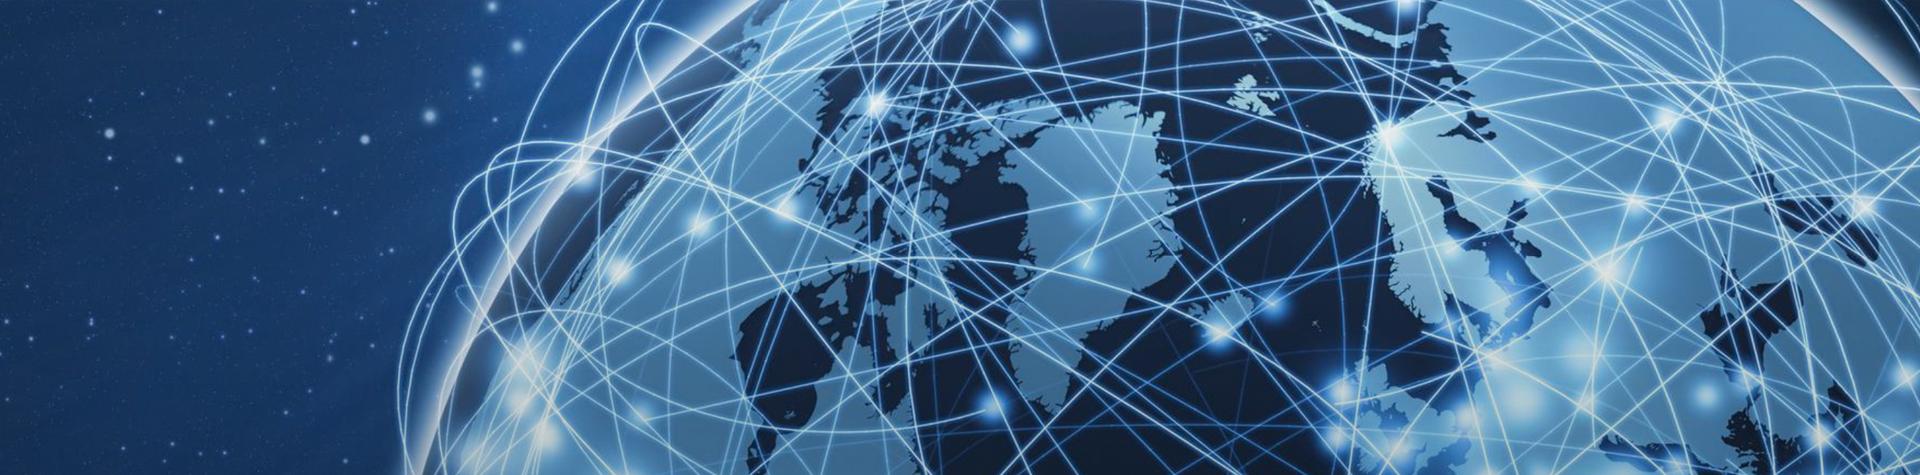 artistic rendering of global networking